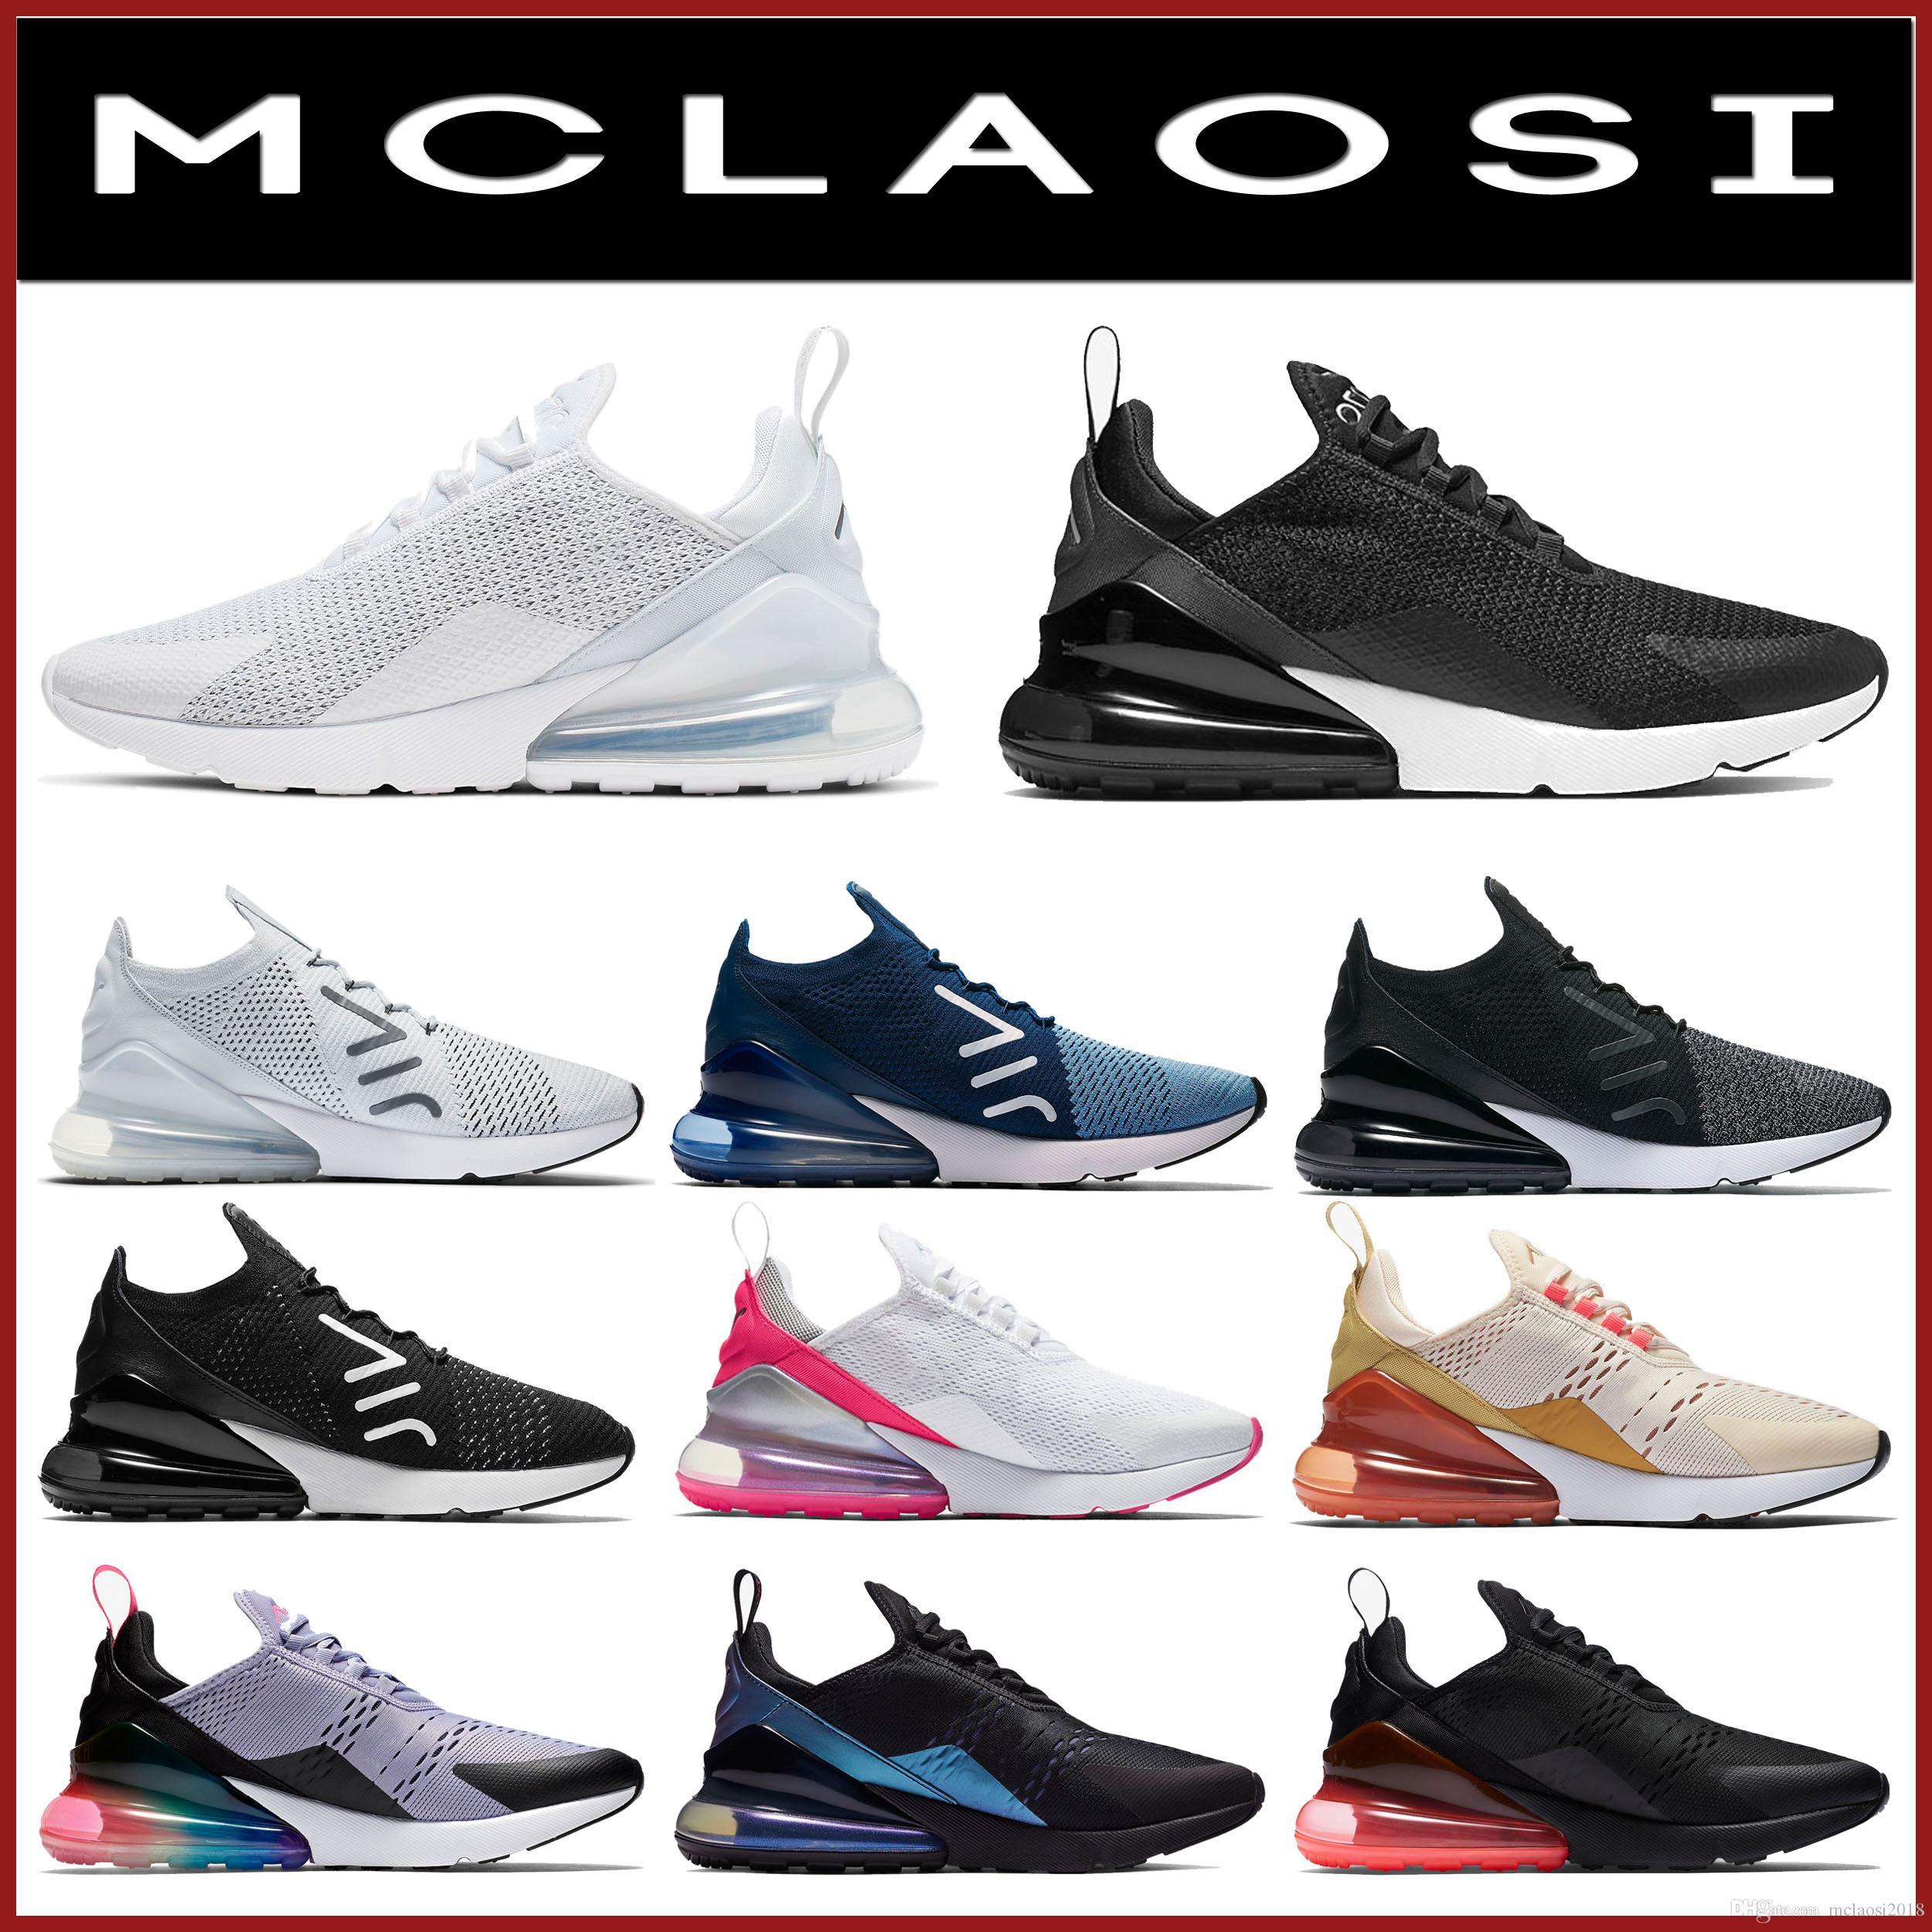 MCLAOSI للبيع أفضل 2020 270 رجل جديد الاحذية والمدربين 27C النساء أحذية رياضية والرياضة shoes.The آخر 270 رجال ونساء أحذية رياضية